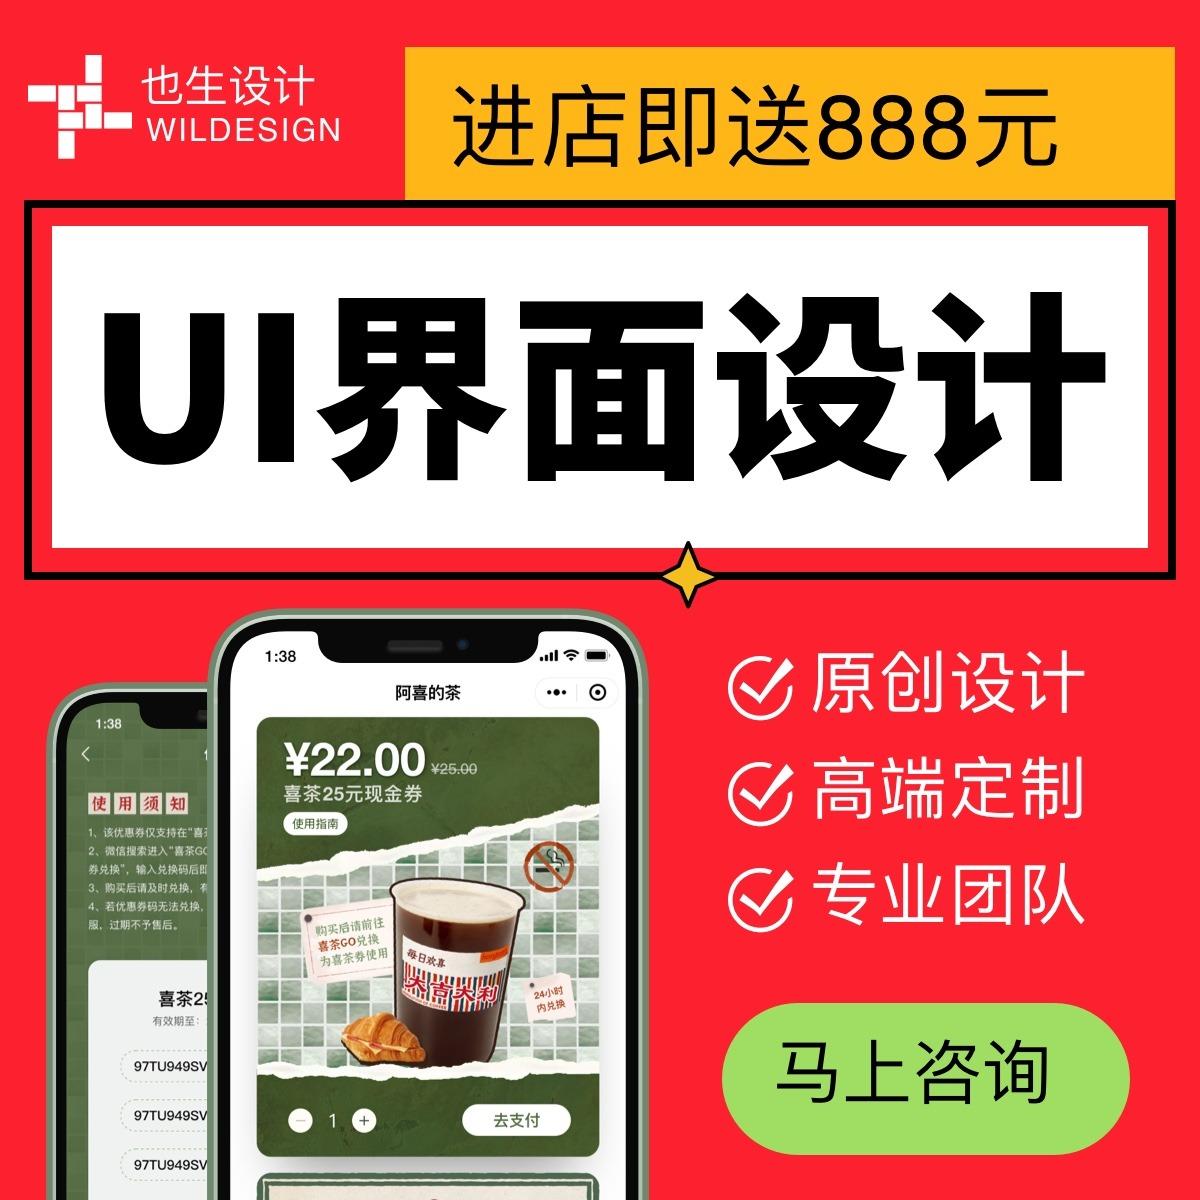 【UI小程序】UI界面设计/APP界面/微信小程序/H5设计